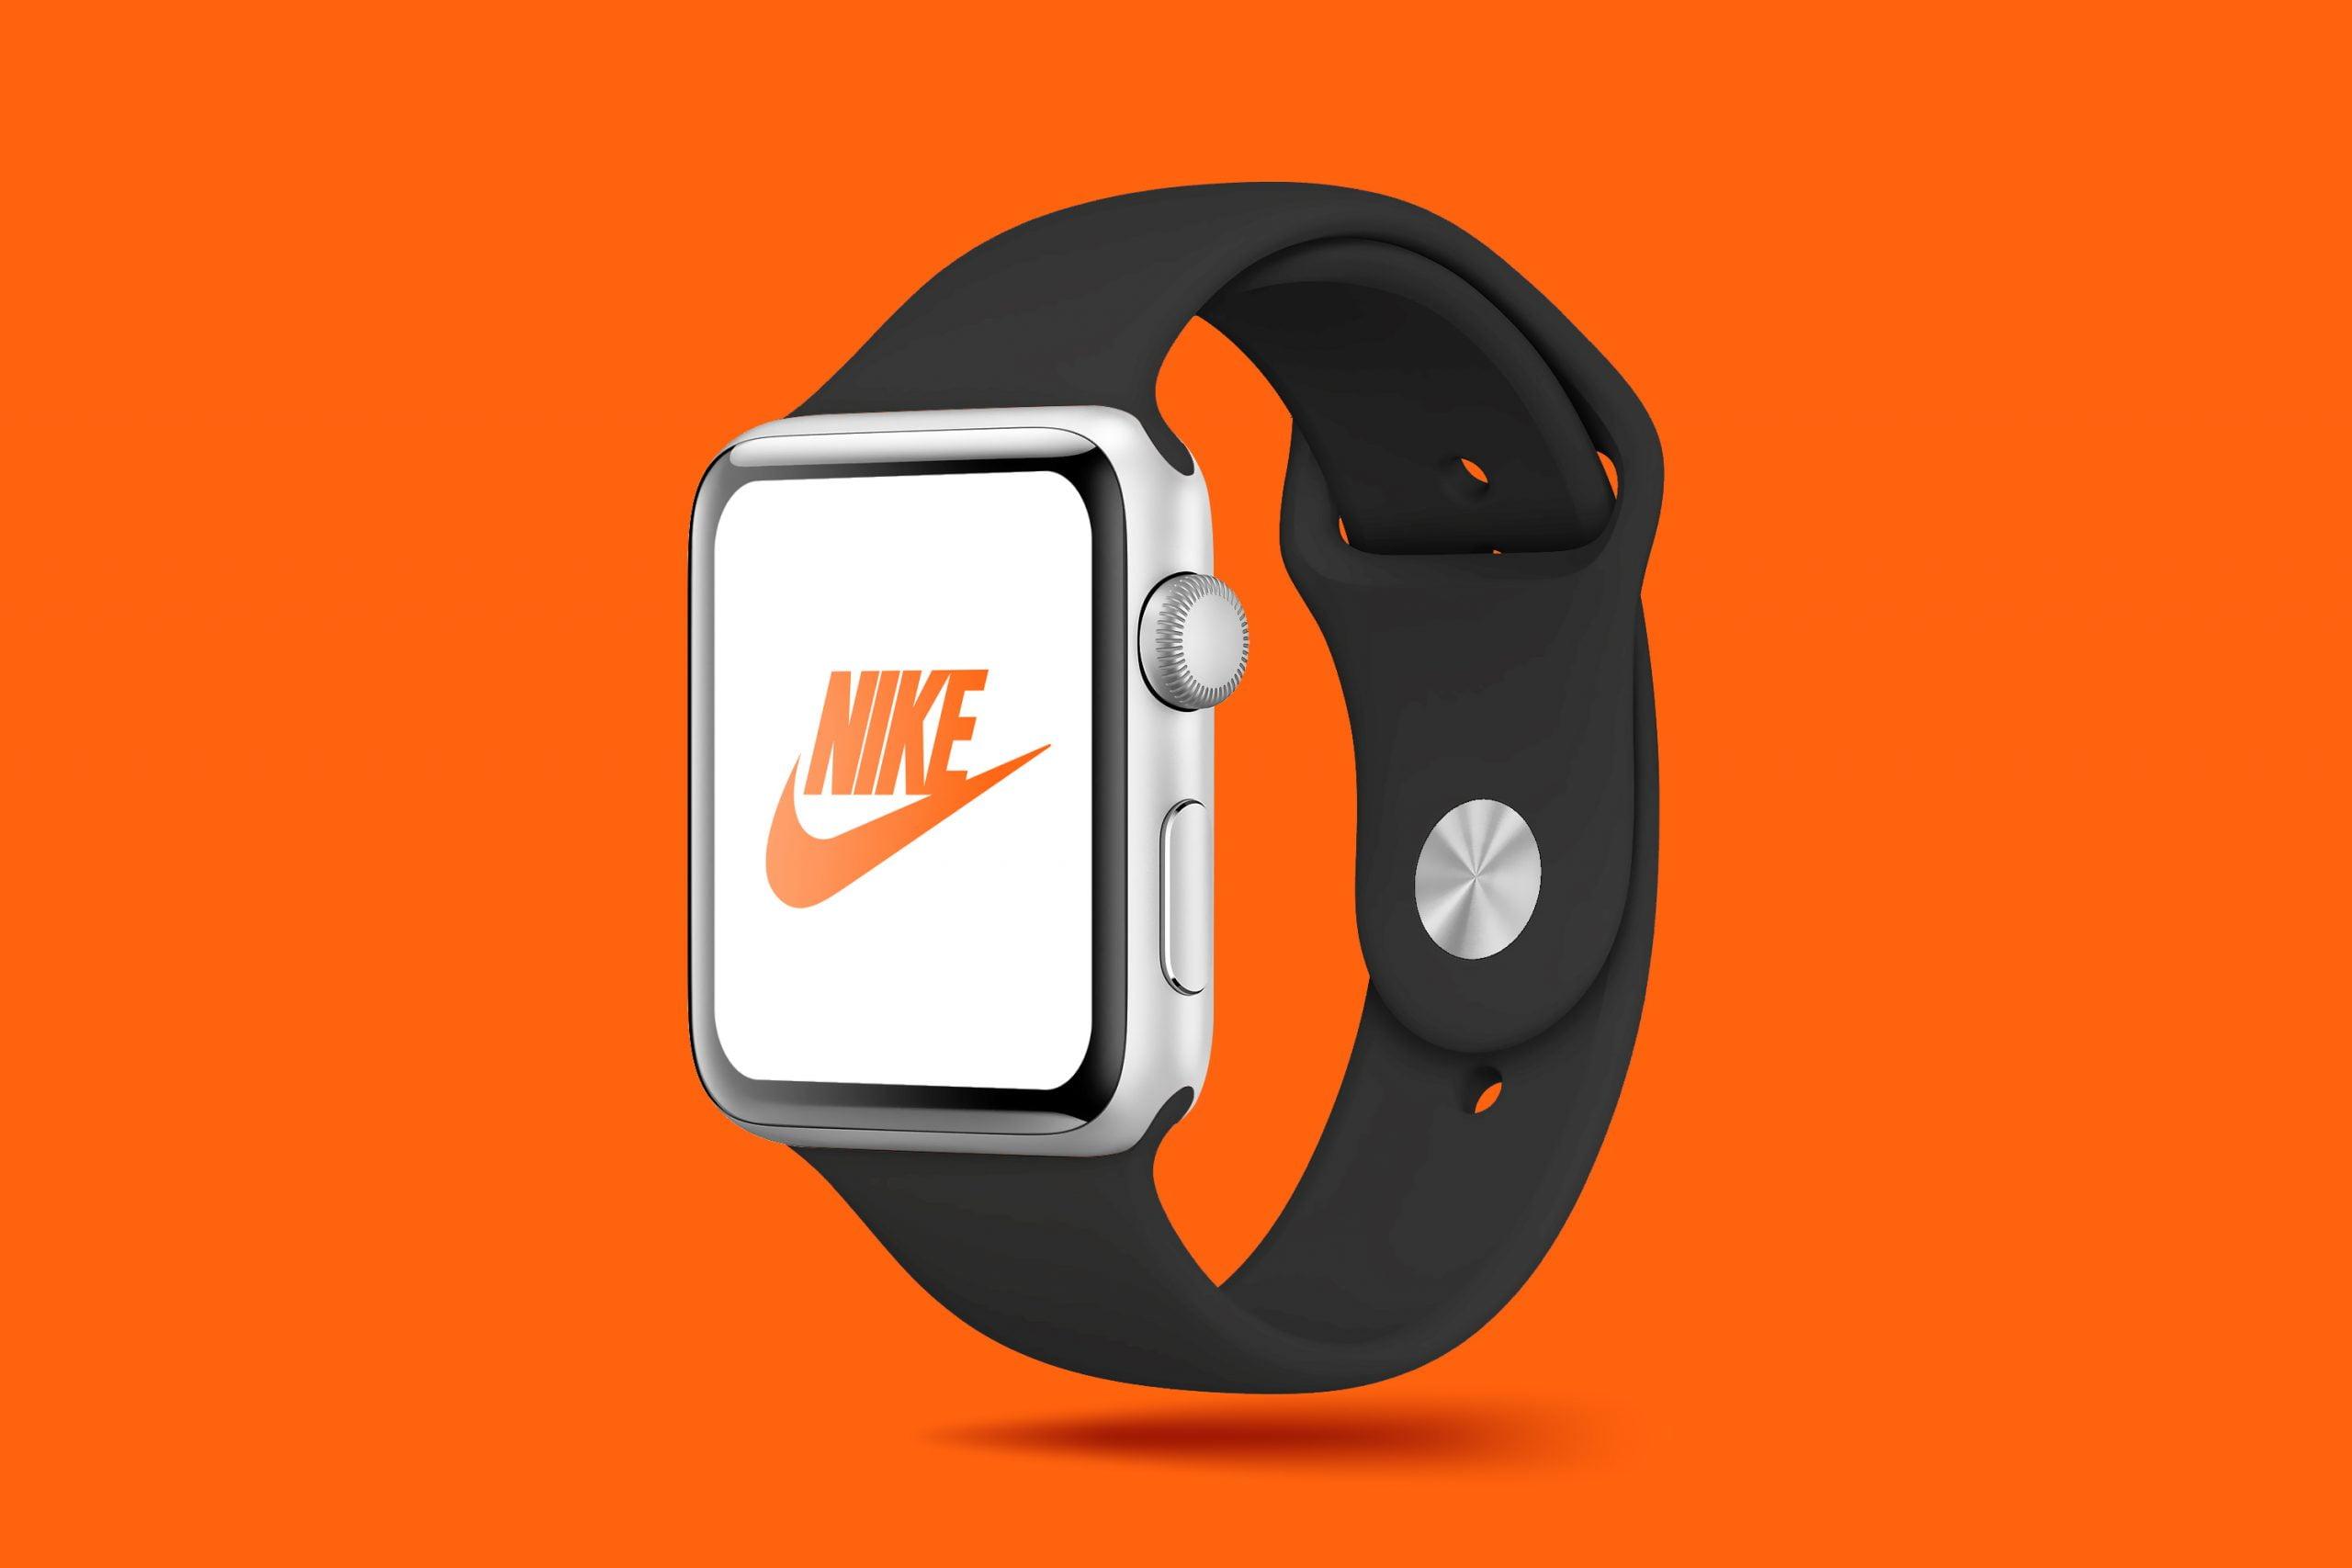 Smart Watch Mockup Design 3